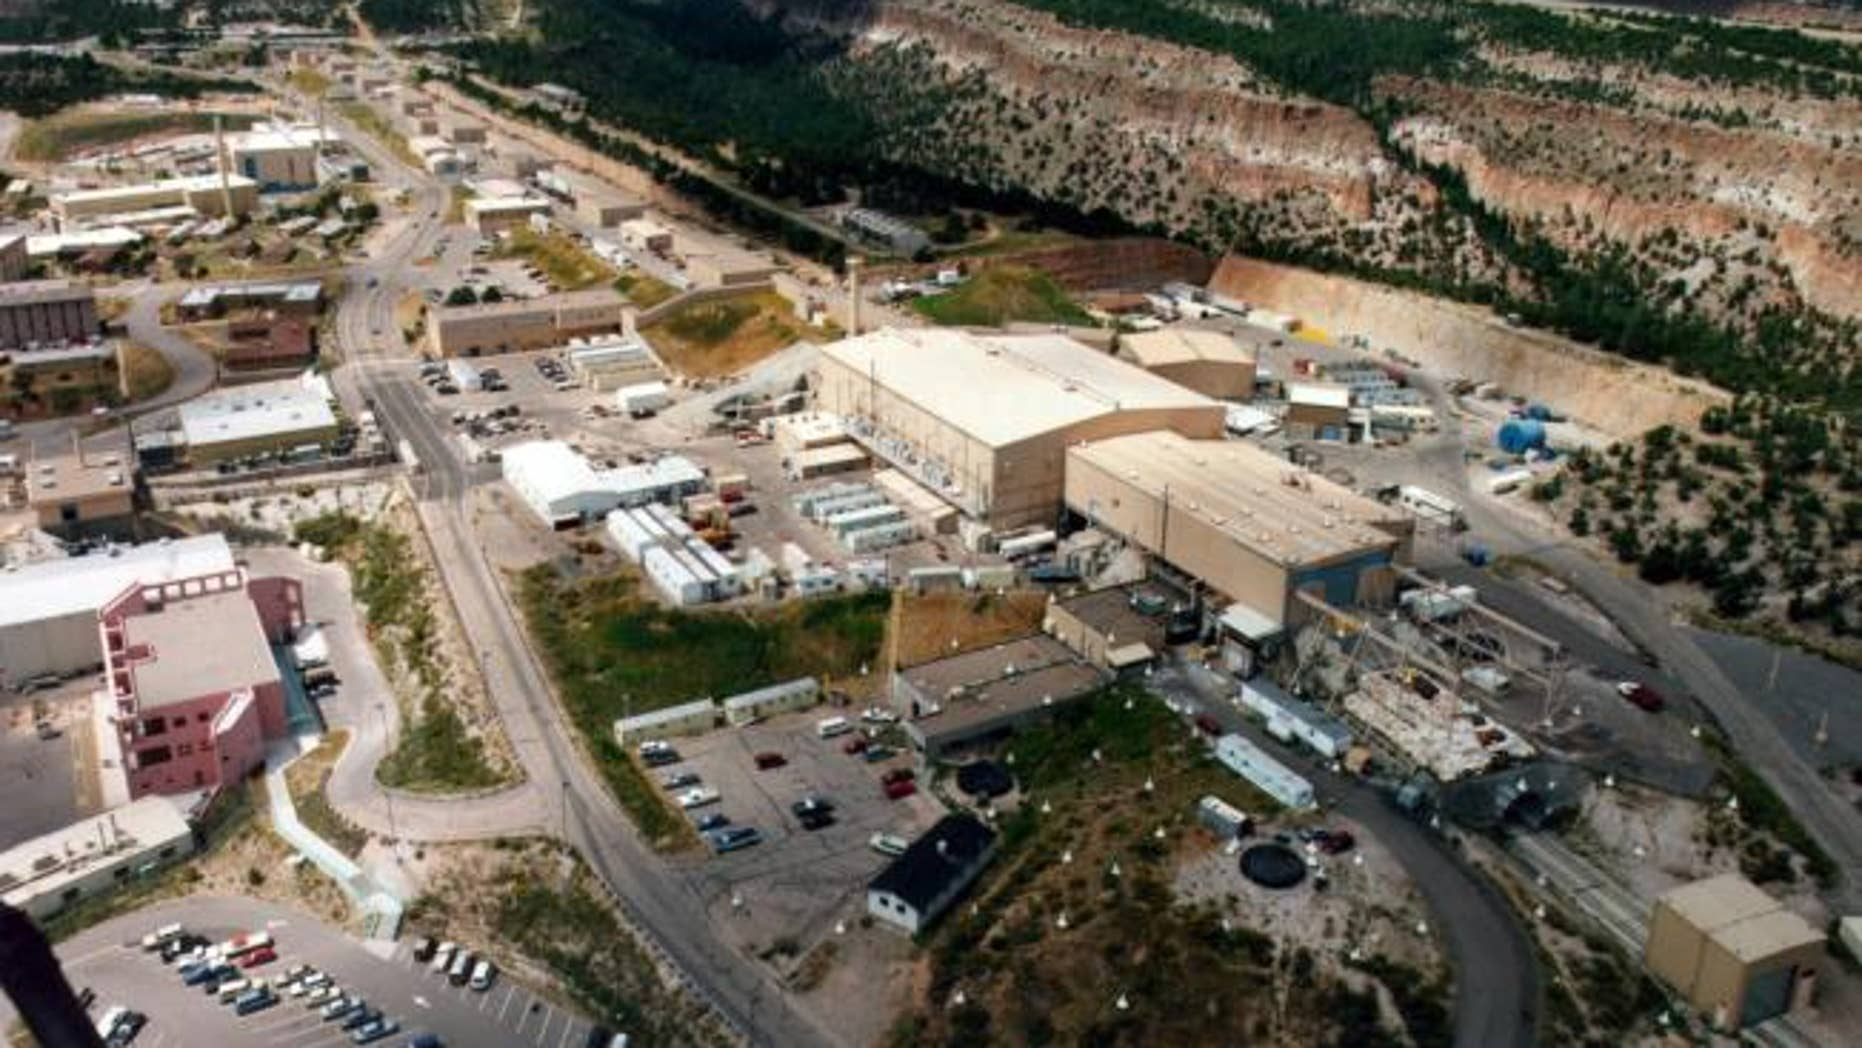 The Los Alamos National Laboratory. (AP Photo/Albuquerque Journal)